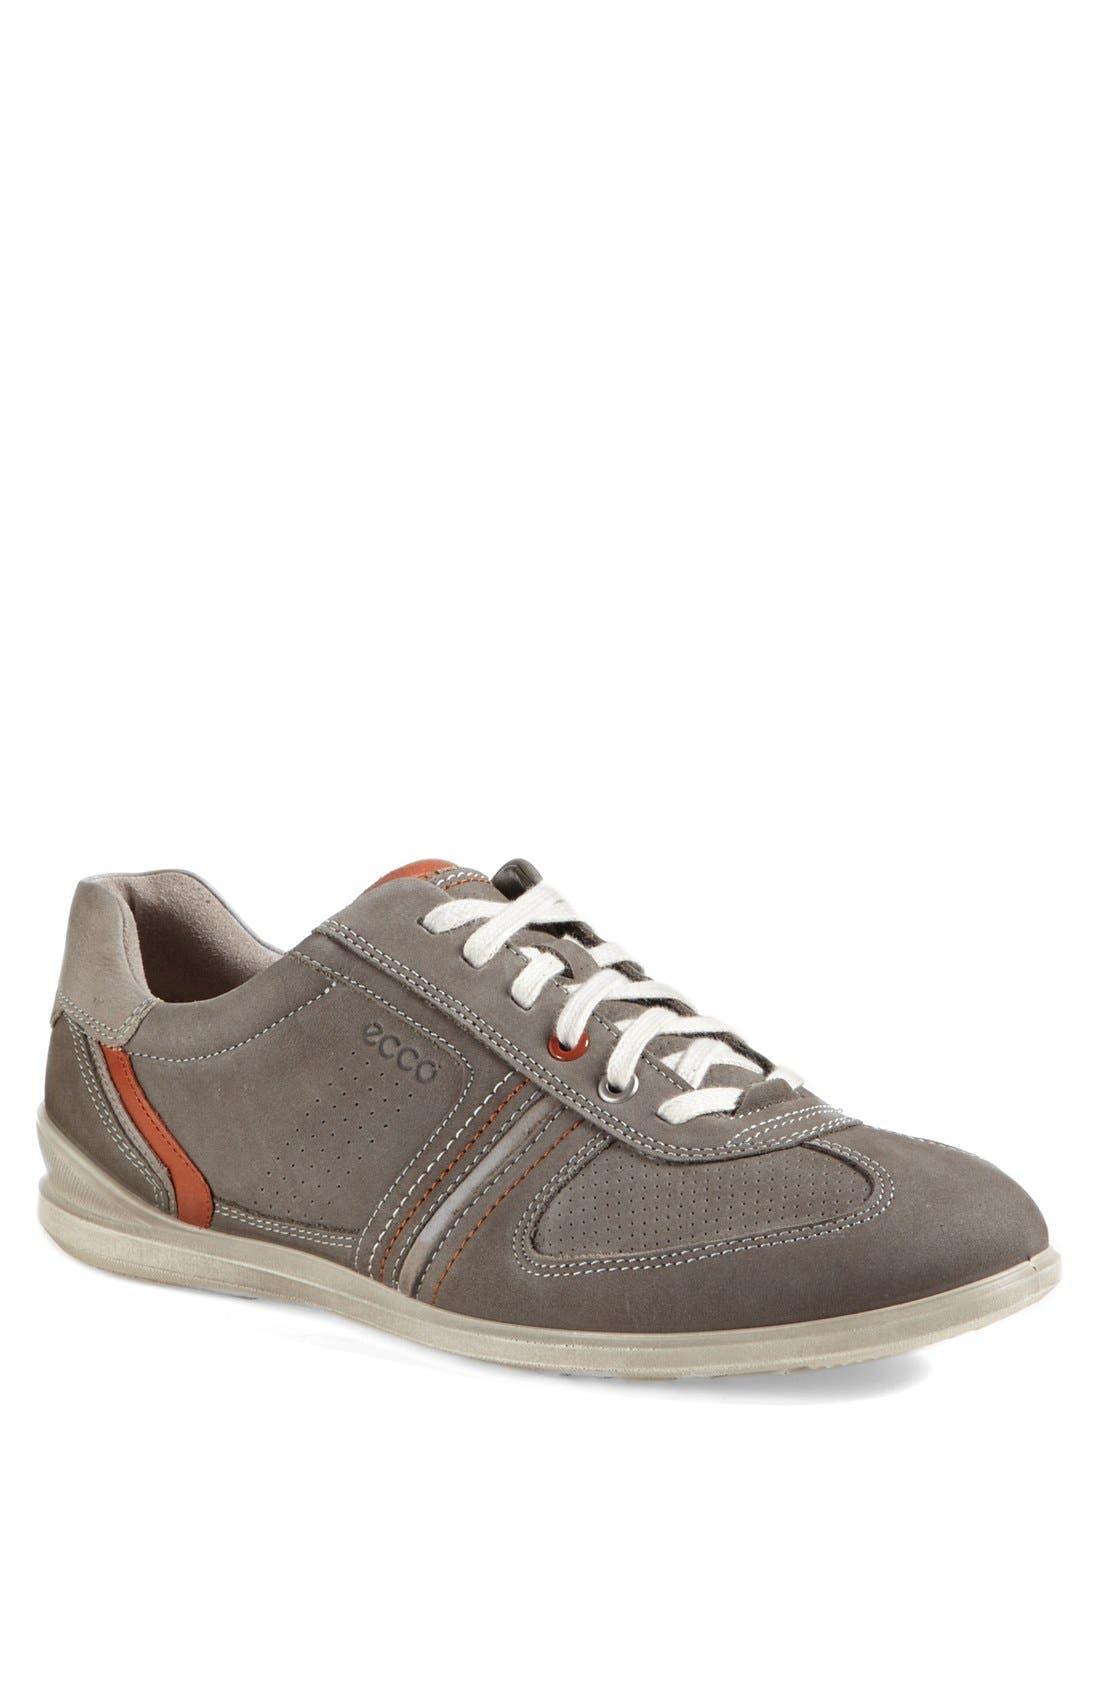 Main Image - ECCO 'Chander' Sneaker (Men)